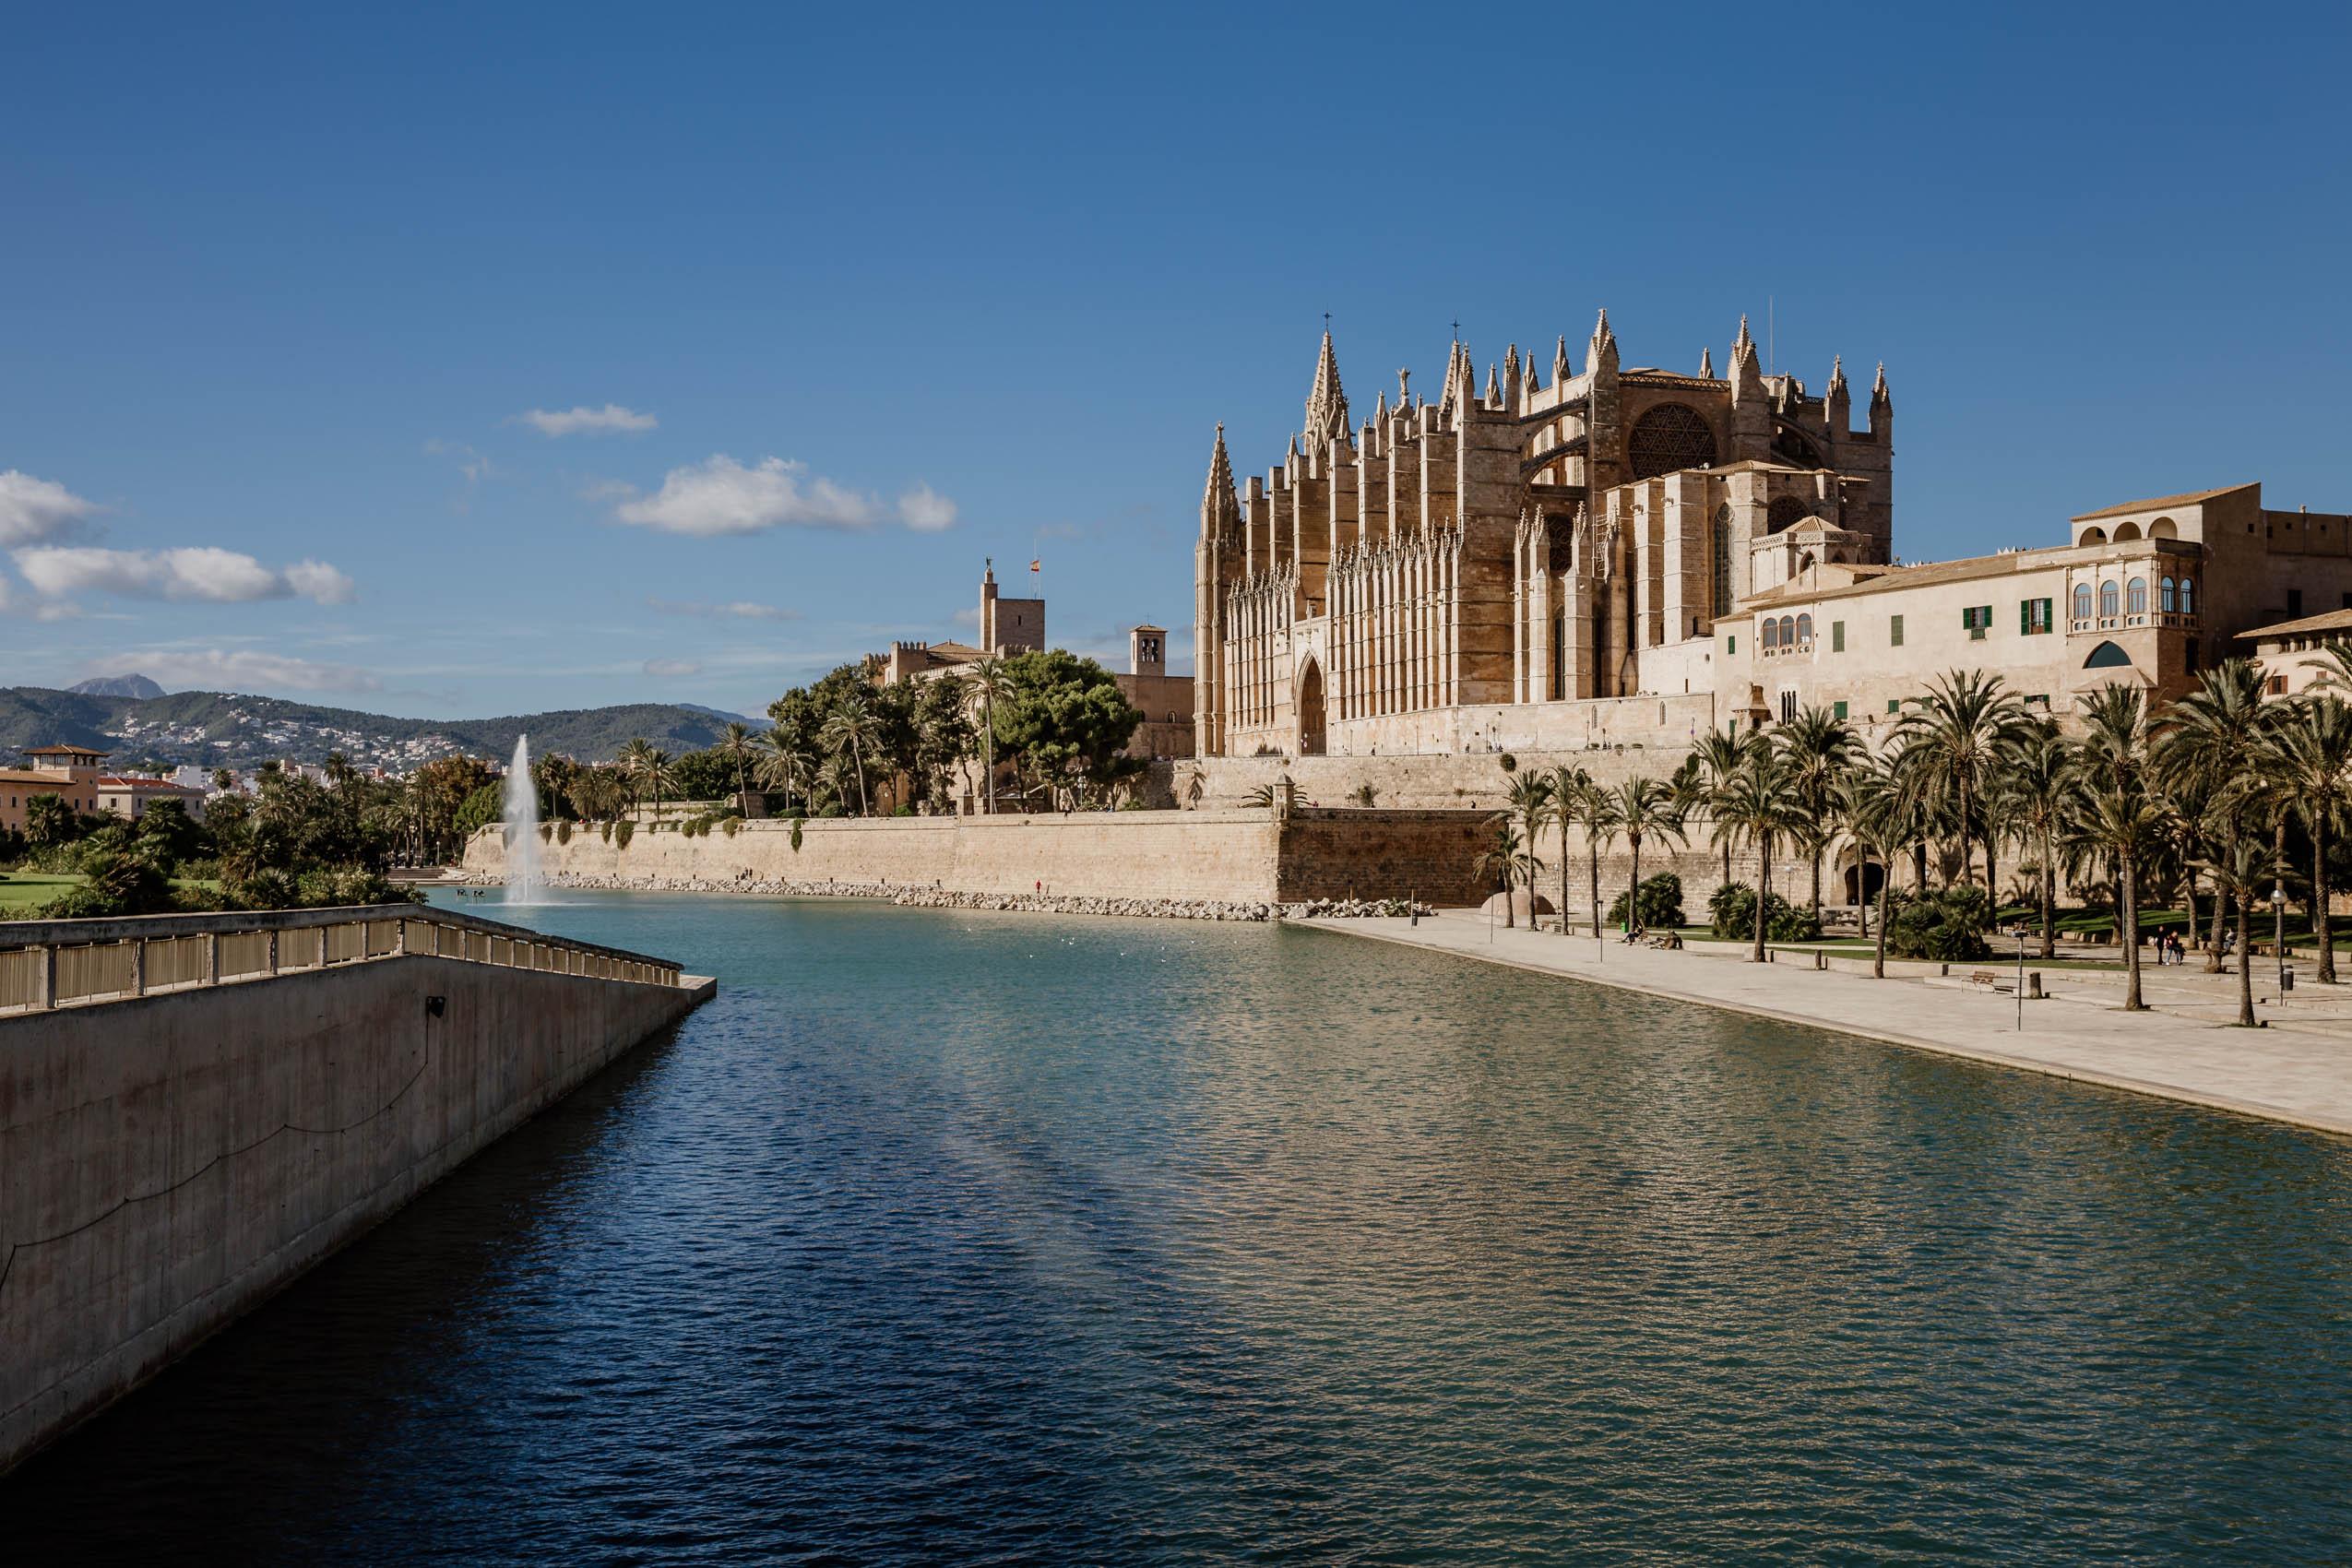 Mallorca, part 1- What to see in Palma de Mallorca